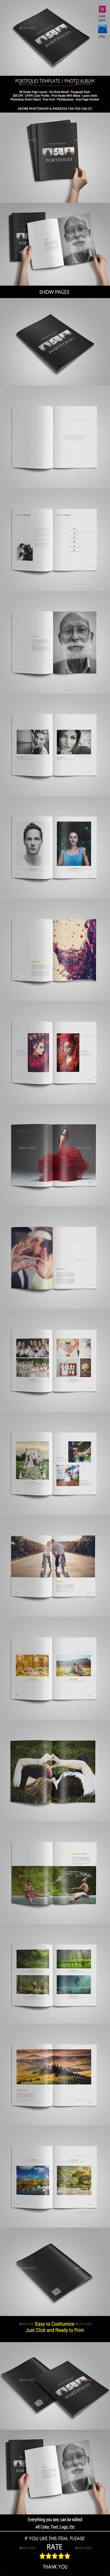 Photographer Portfolio / Photo Album - Portfolio Brochures